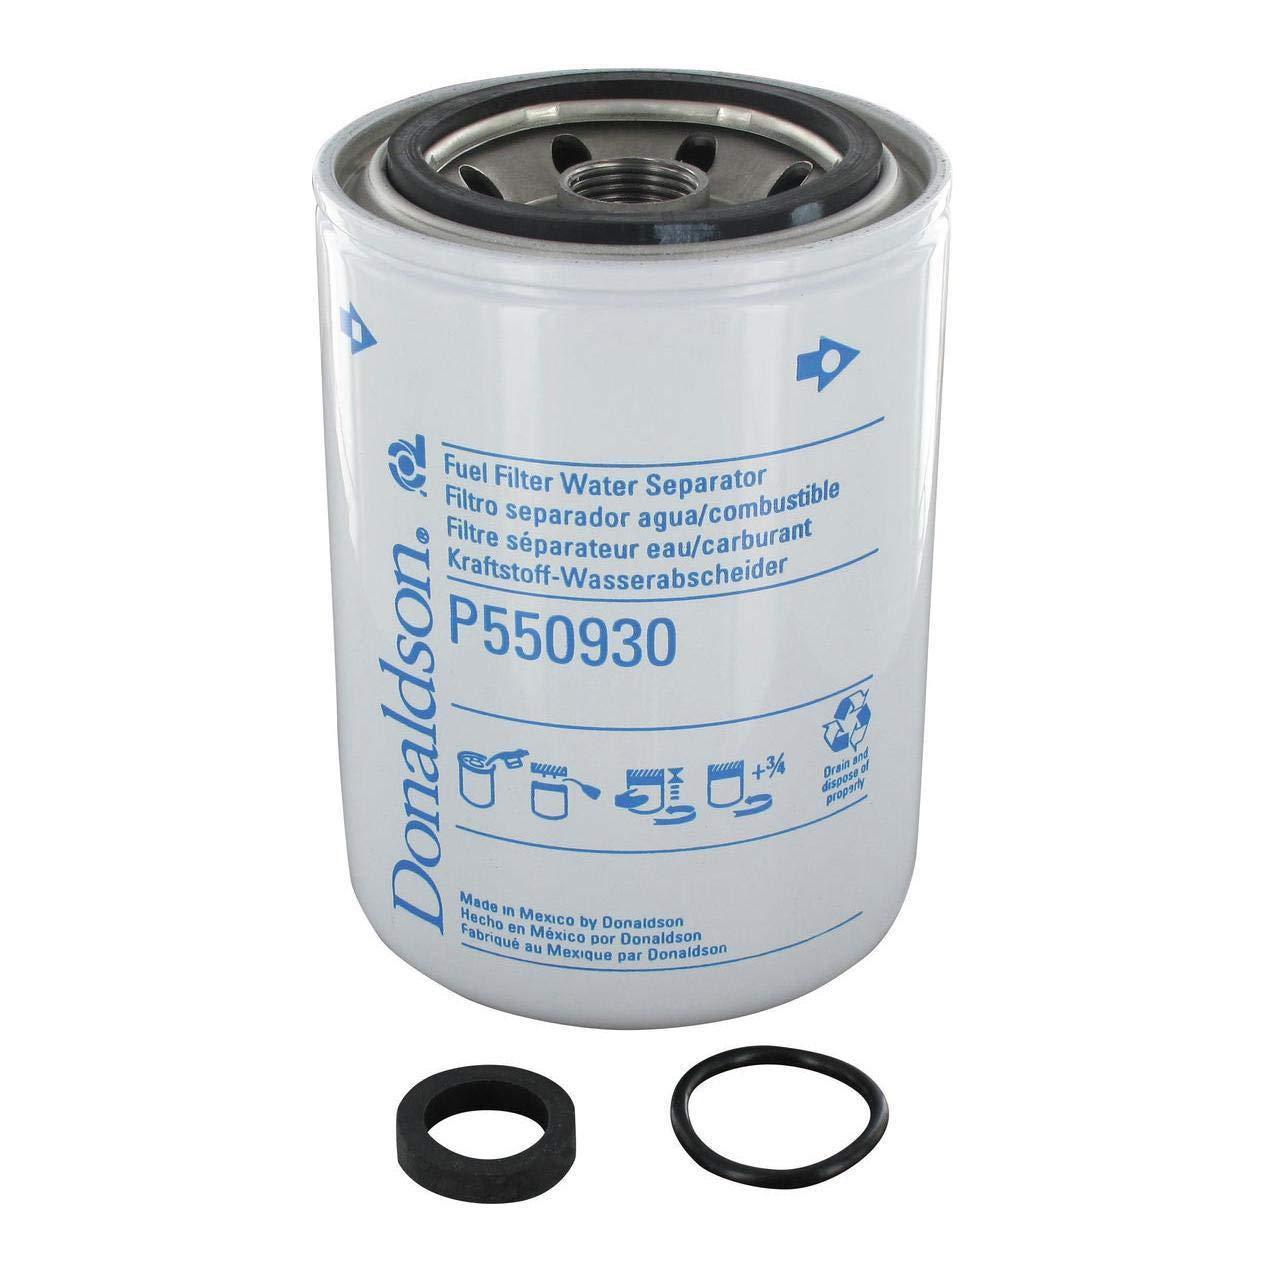 kfP550930 Donaldson P550930 Filter Donaldson Company Inc